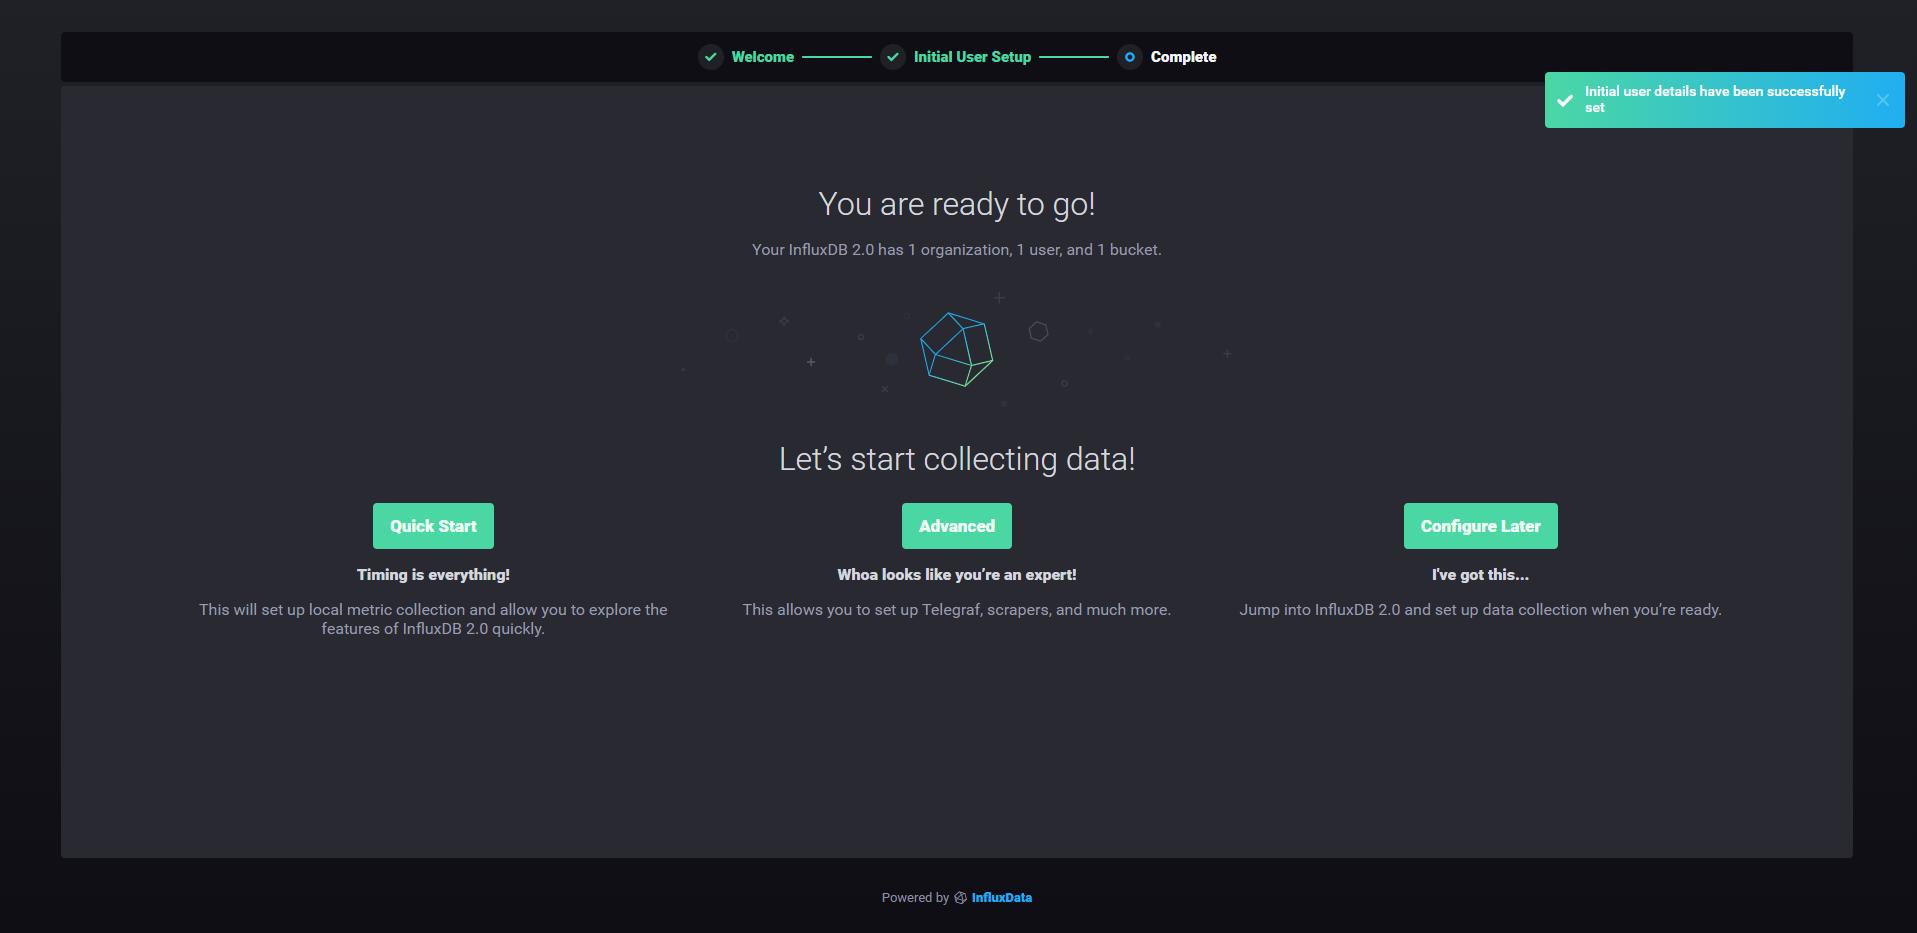 InfluxDB 2.0 ready to go screen